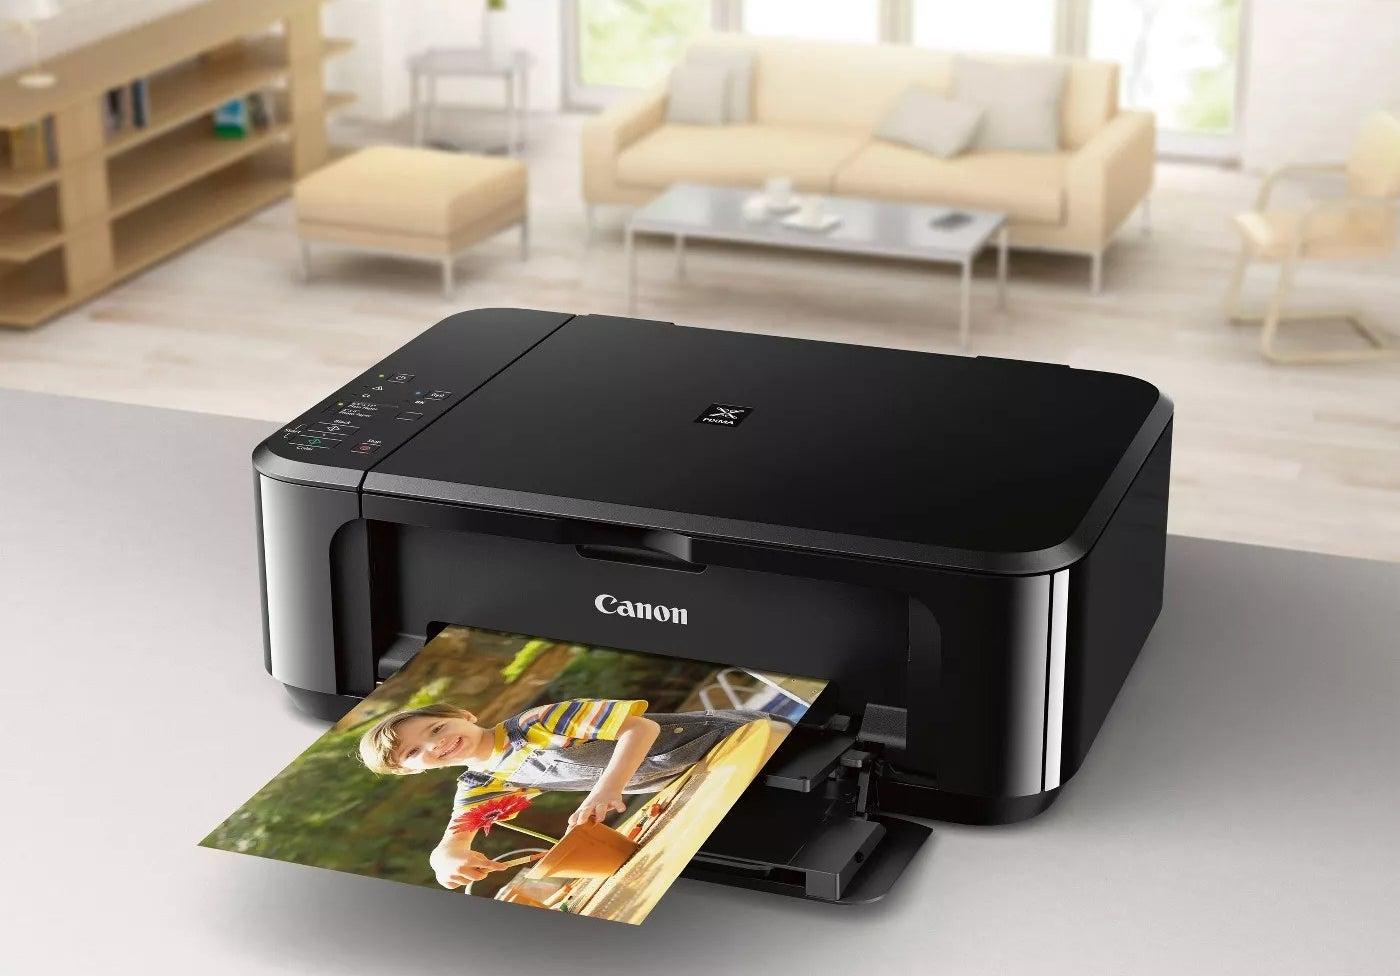 The printer printing a large photo